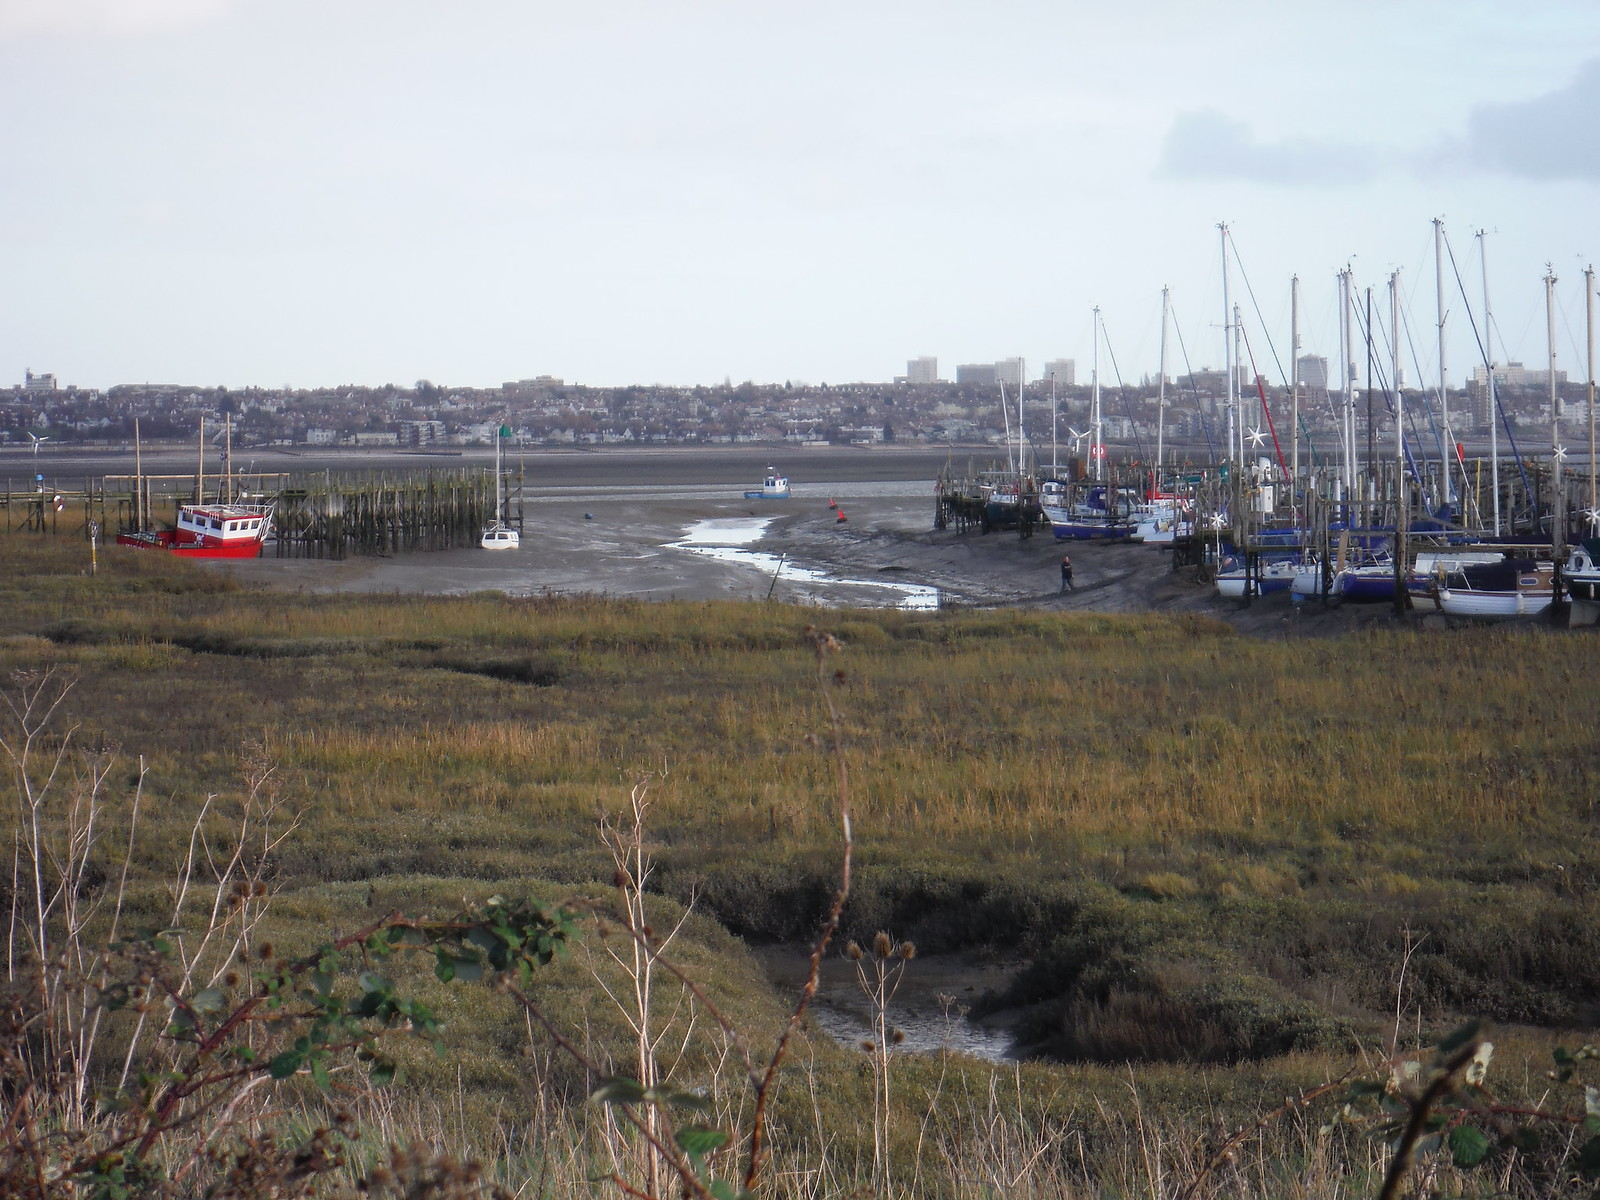 Smallgains Marina and Southend-on-Sea, from Canvey Island SWC Walk 258 Benfleet Circular (via Canvey Island)